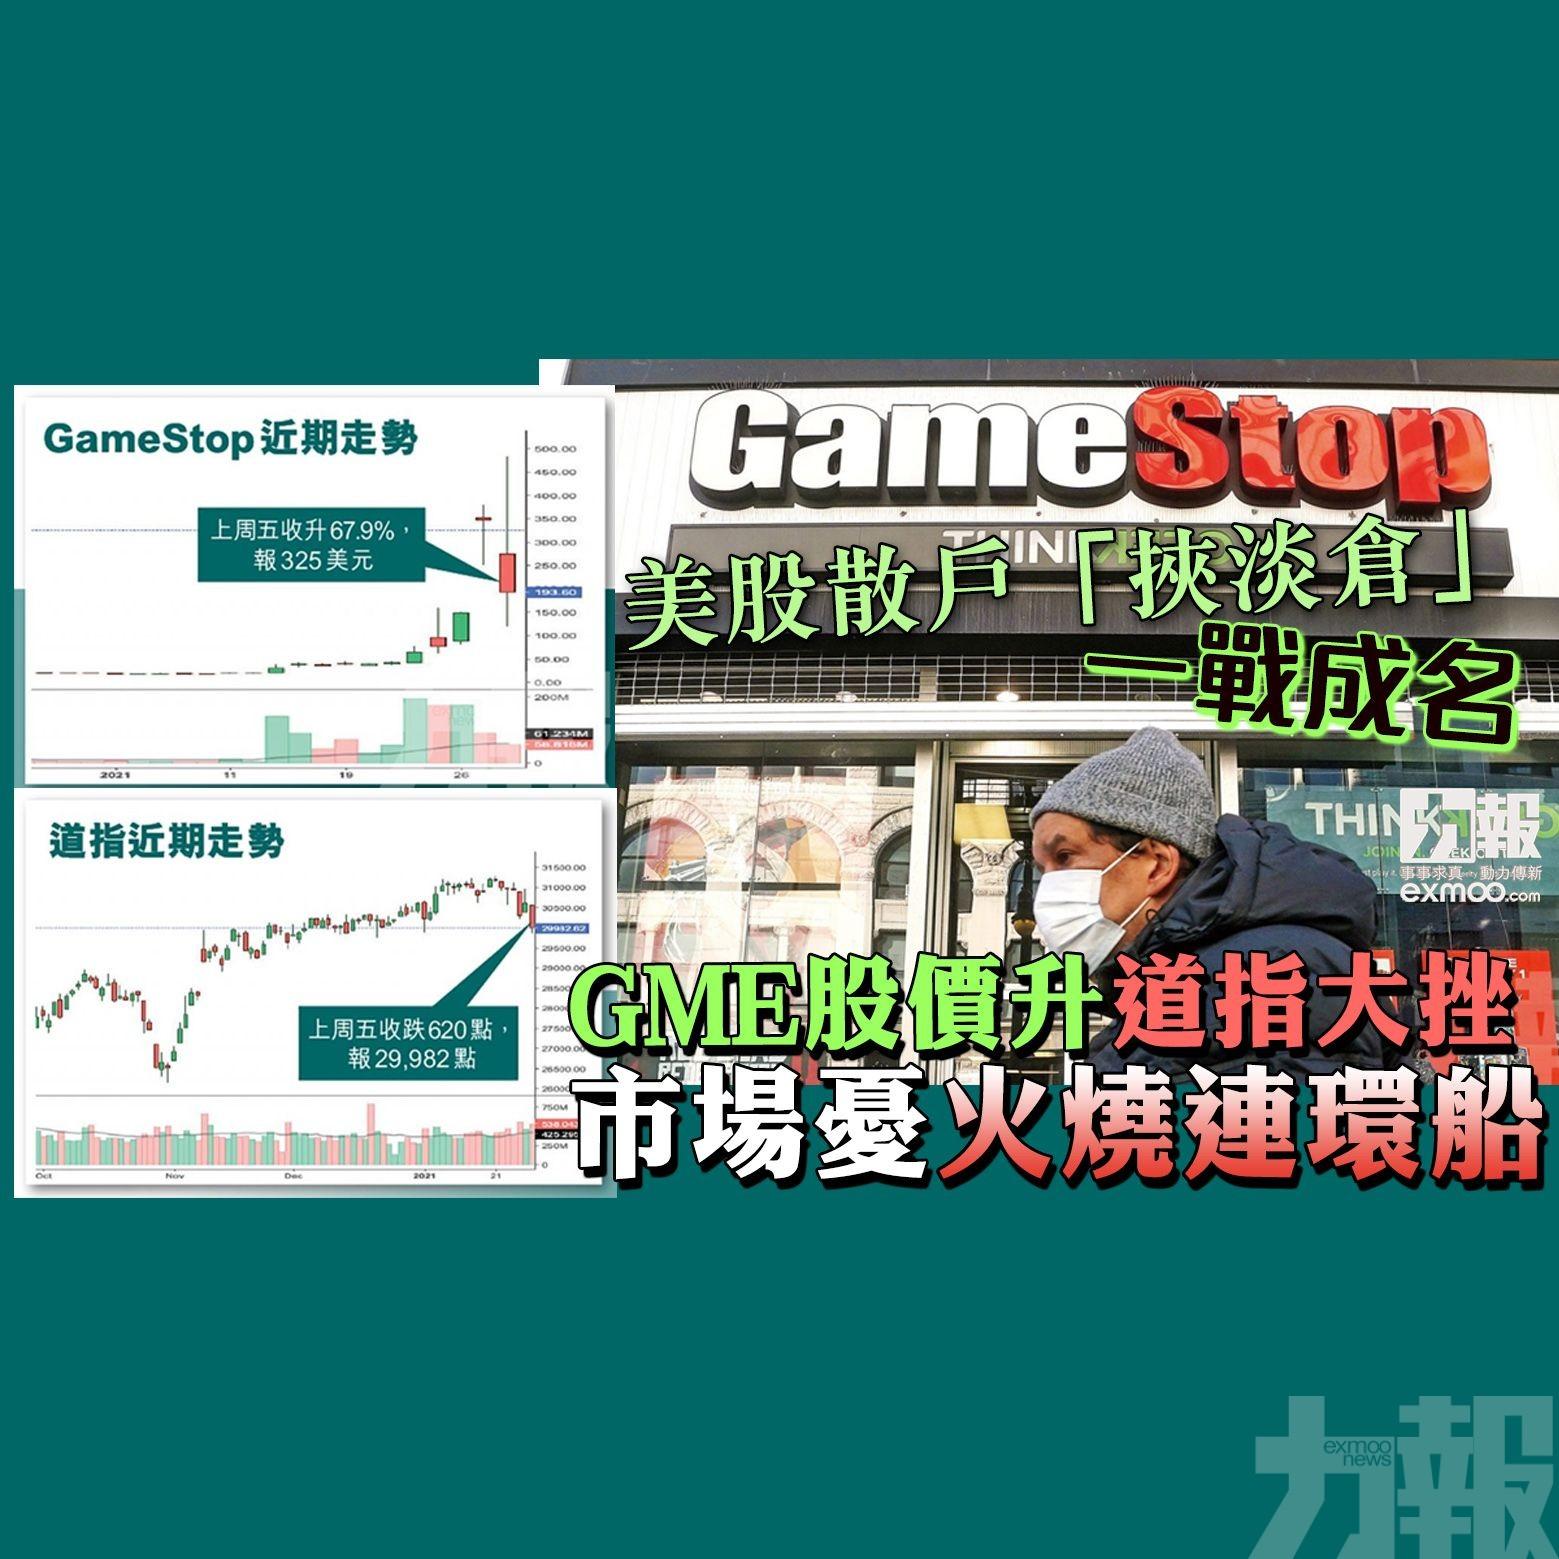 GME股價升 道指大挫市場憂火燒連環船